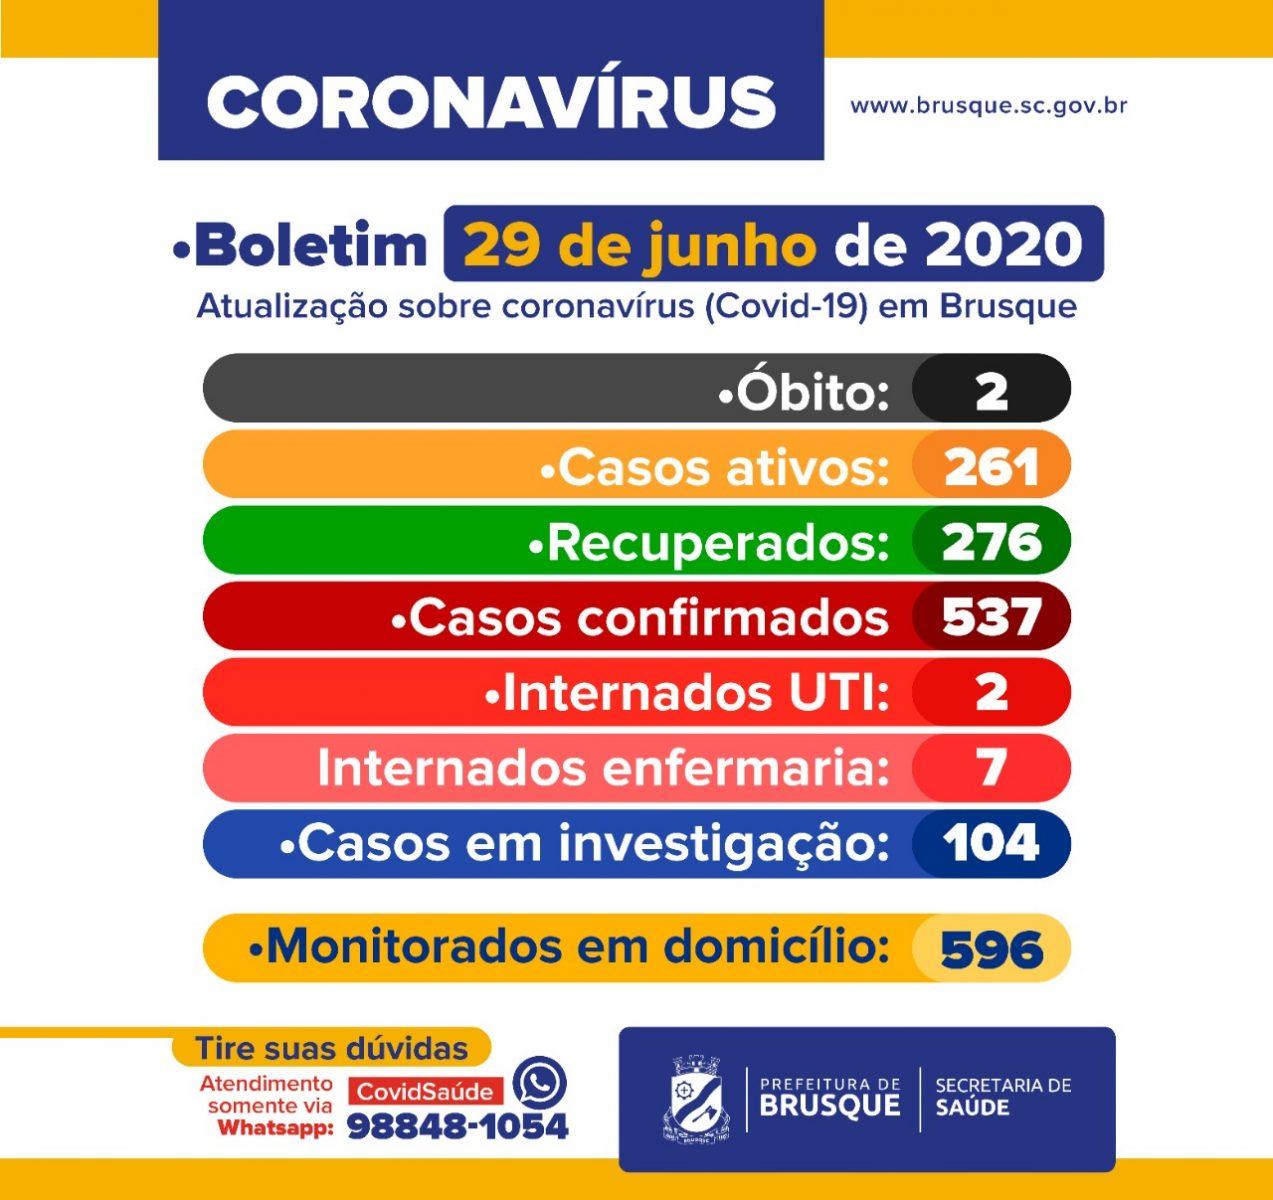 Confira o boletim epidemiológico da Prefeitura de Brusque nesta segunda-feira (29)